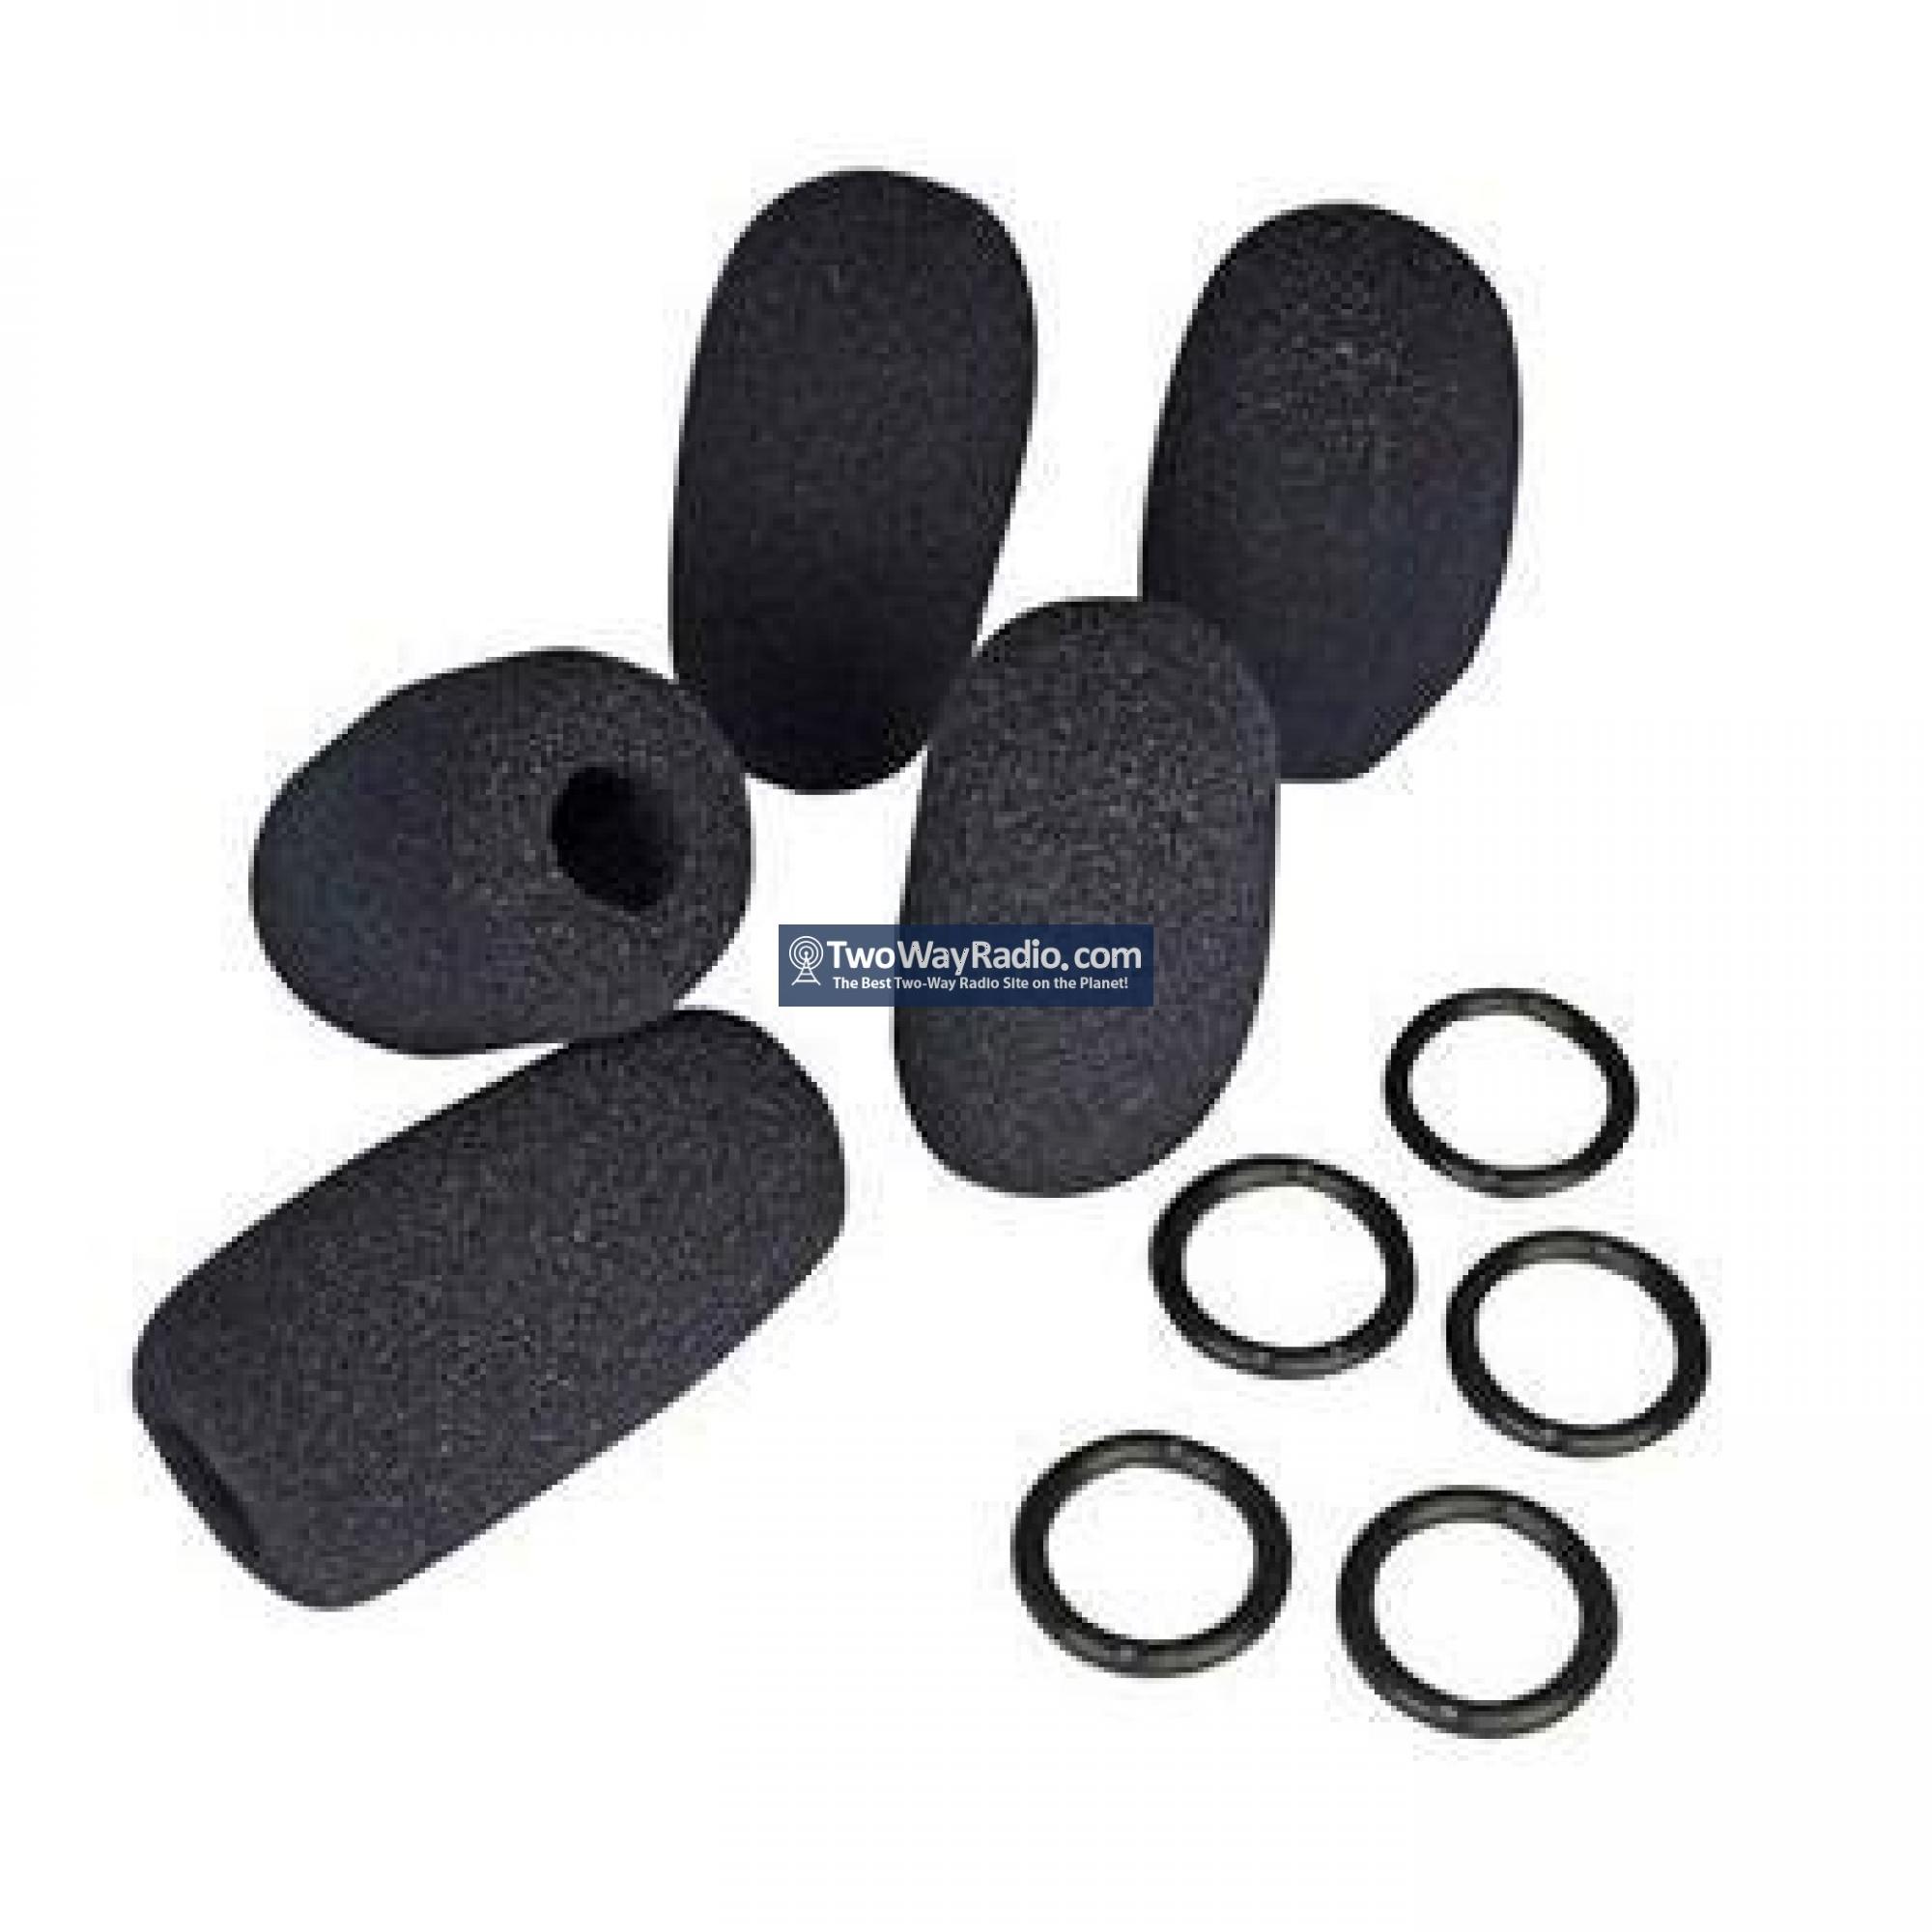 Buy Here | Otto C807420 Hygiene Kit - Windscreens and O-Rings (5 per ...